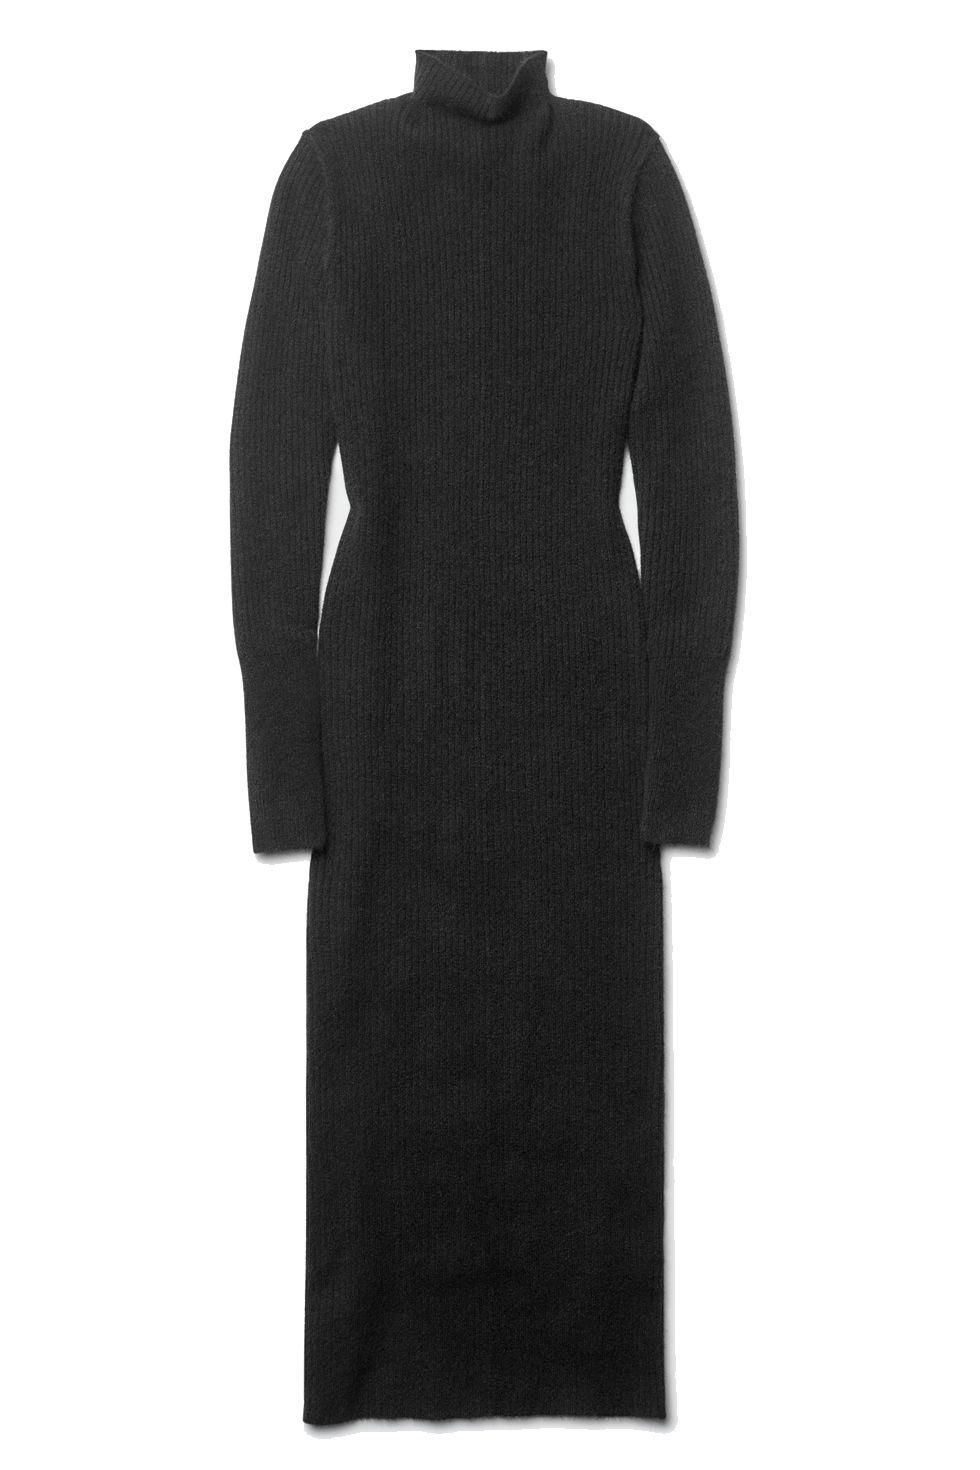 "<p>Wilfred Free Patricia Dress; $115; <a href=""http://us.aritzia.com/product/patricia-dress/57764.html?dwvar_57764_color=6046"">us.aritzia.com</a> </p>"